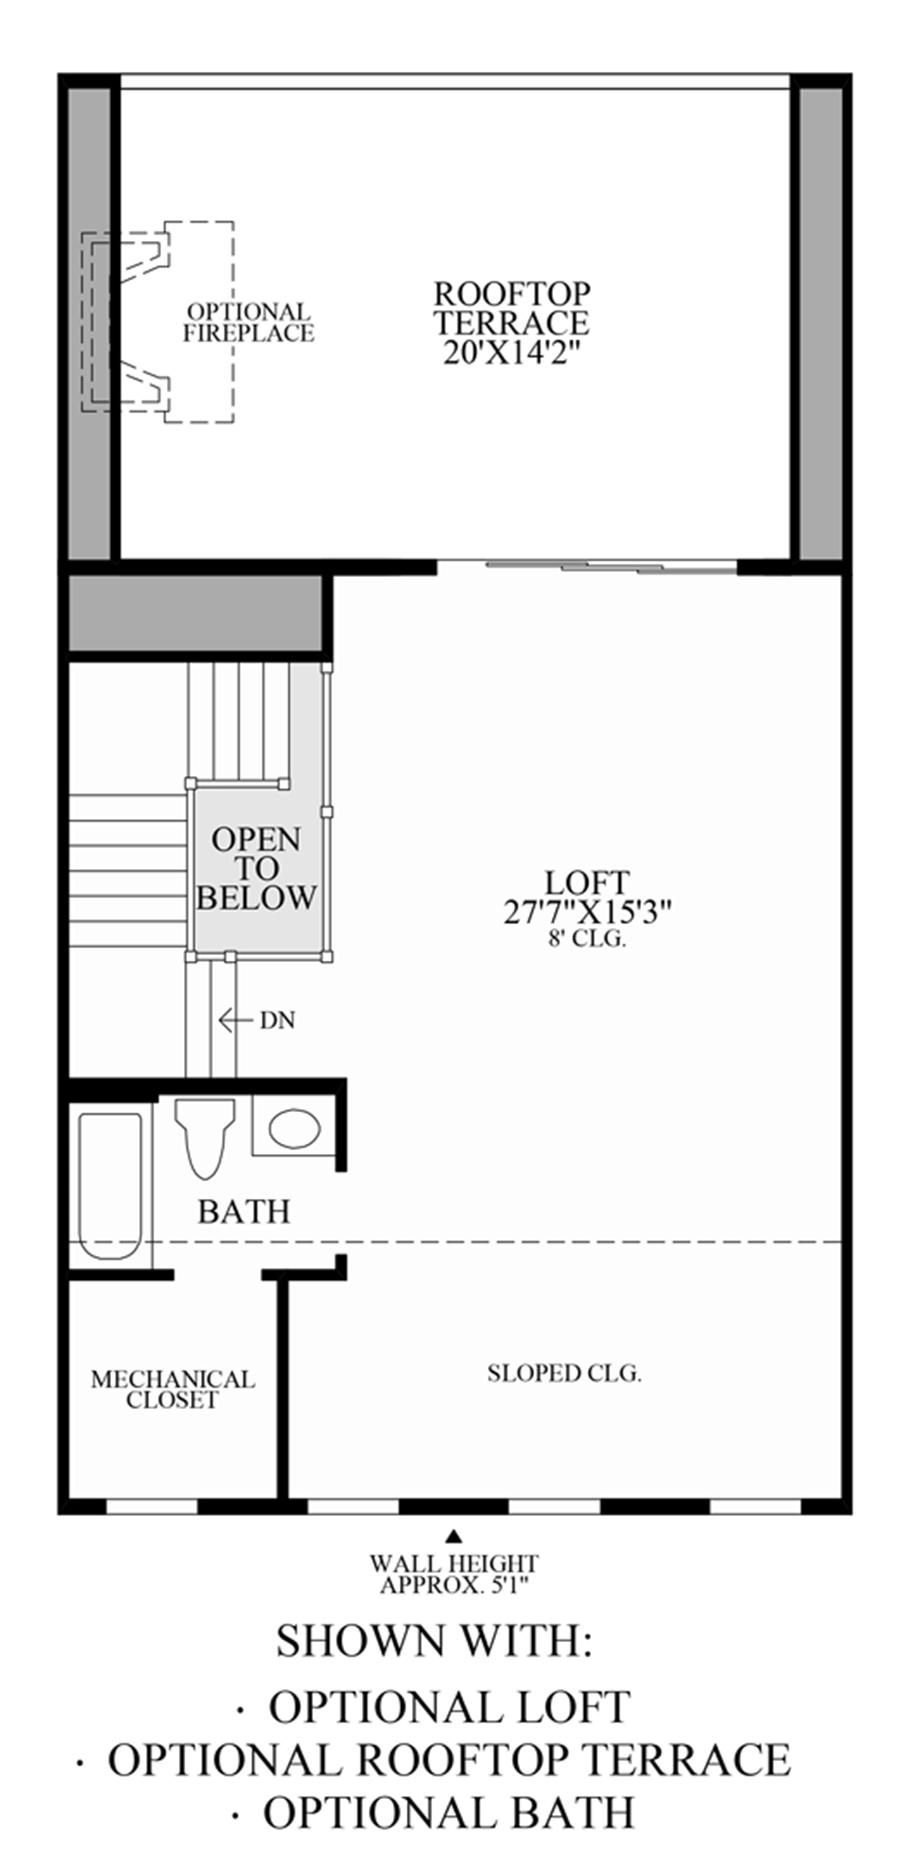 Optional Loft, Rooftop Terrace and Bath Floor Plan